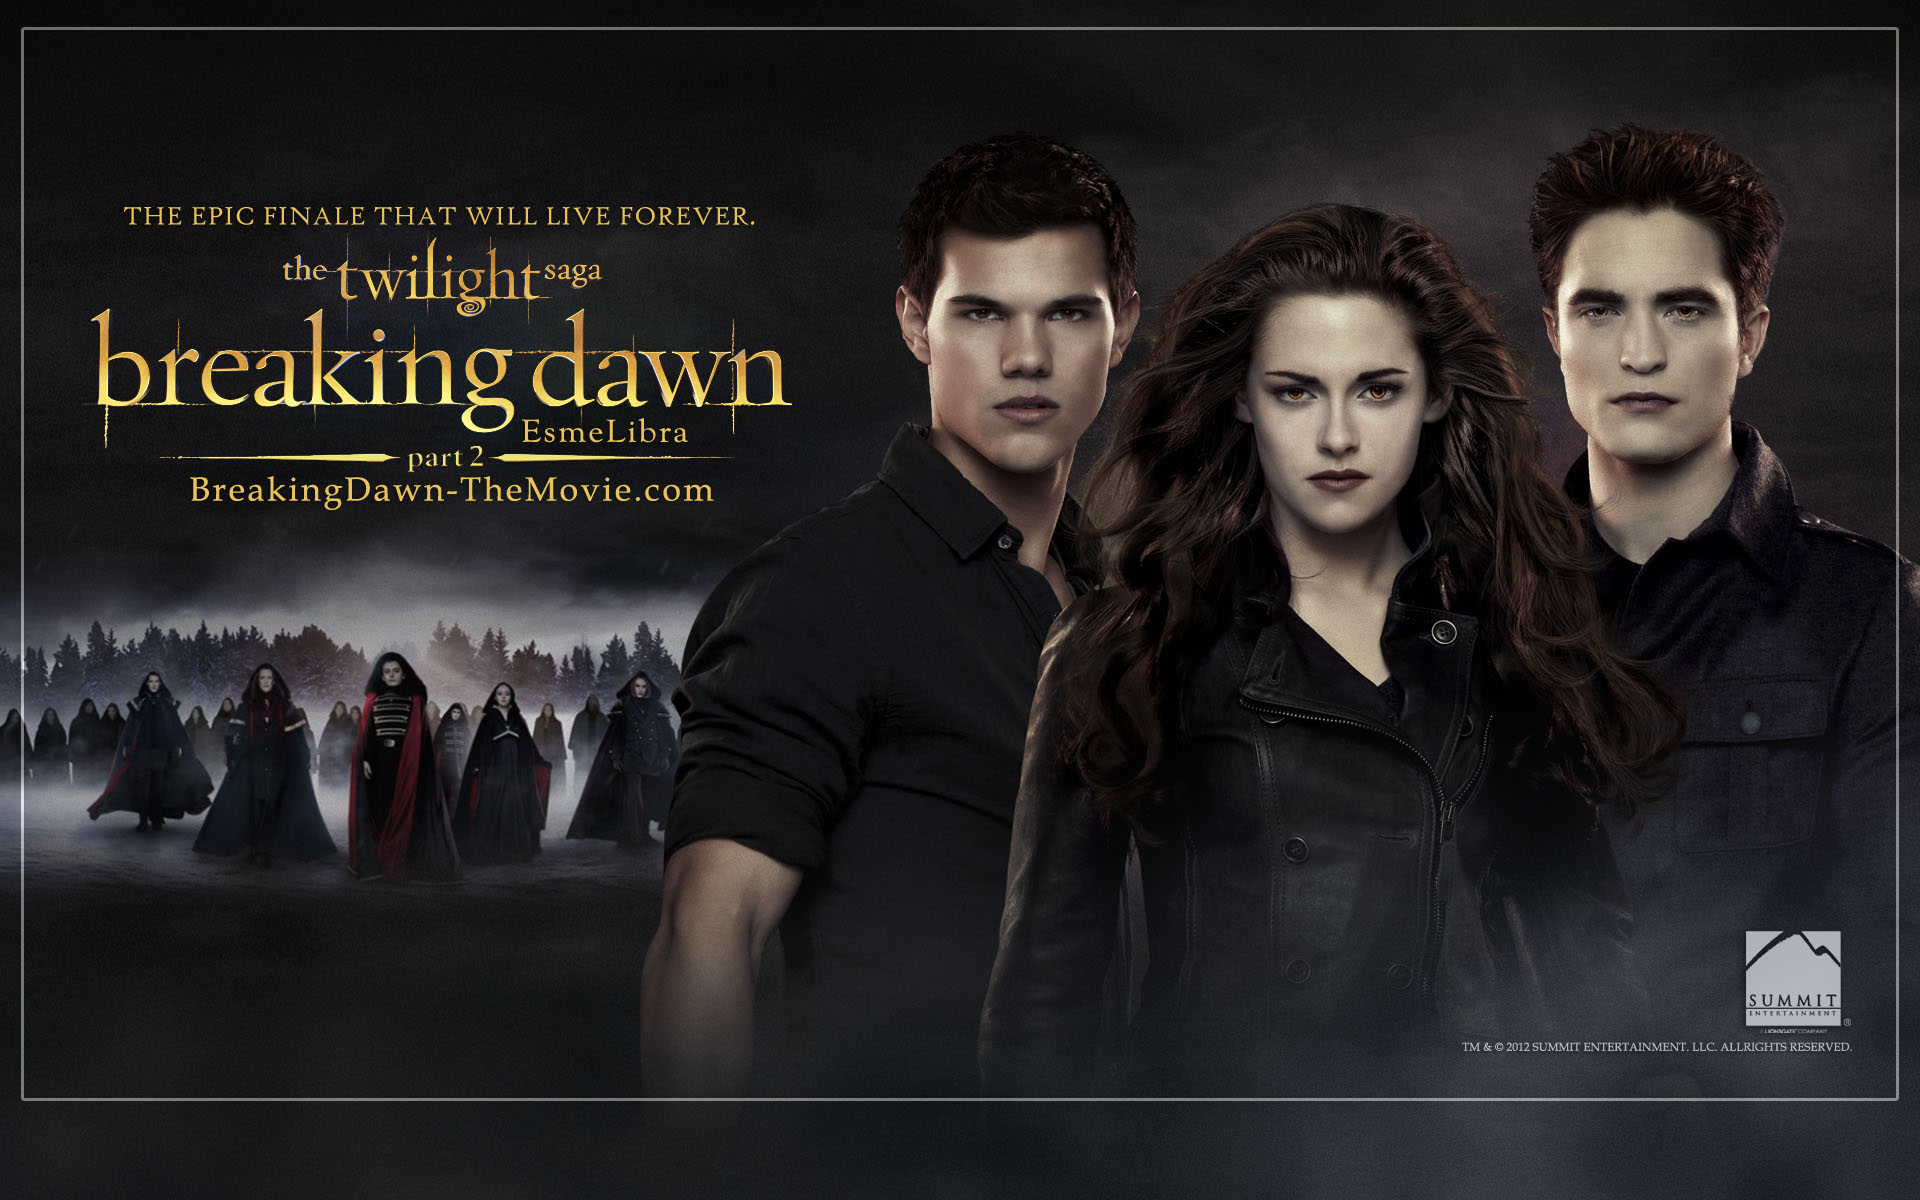 Image breaking dawn part 2 wallpaper twilight series - Twilight breaking dawn wallpaper ...